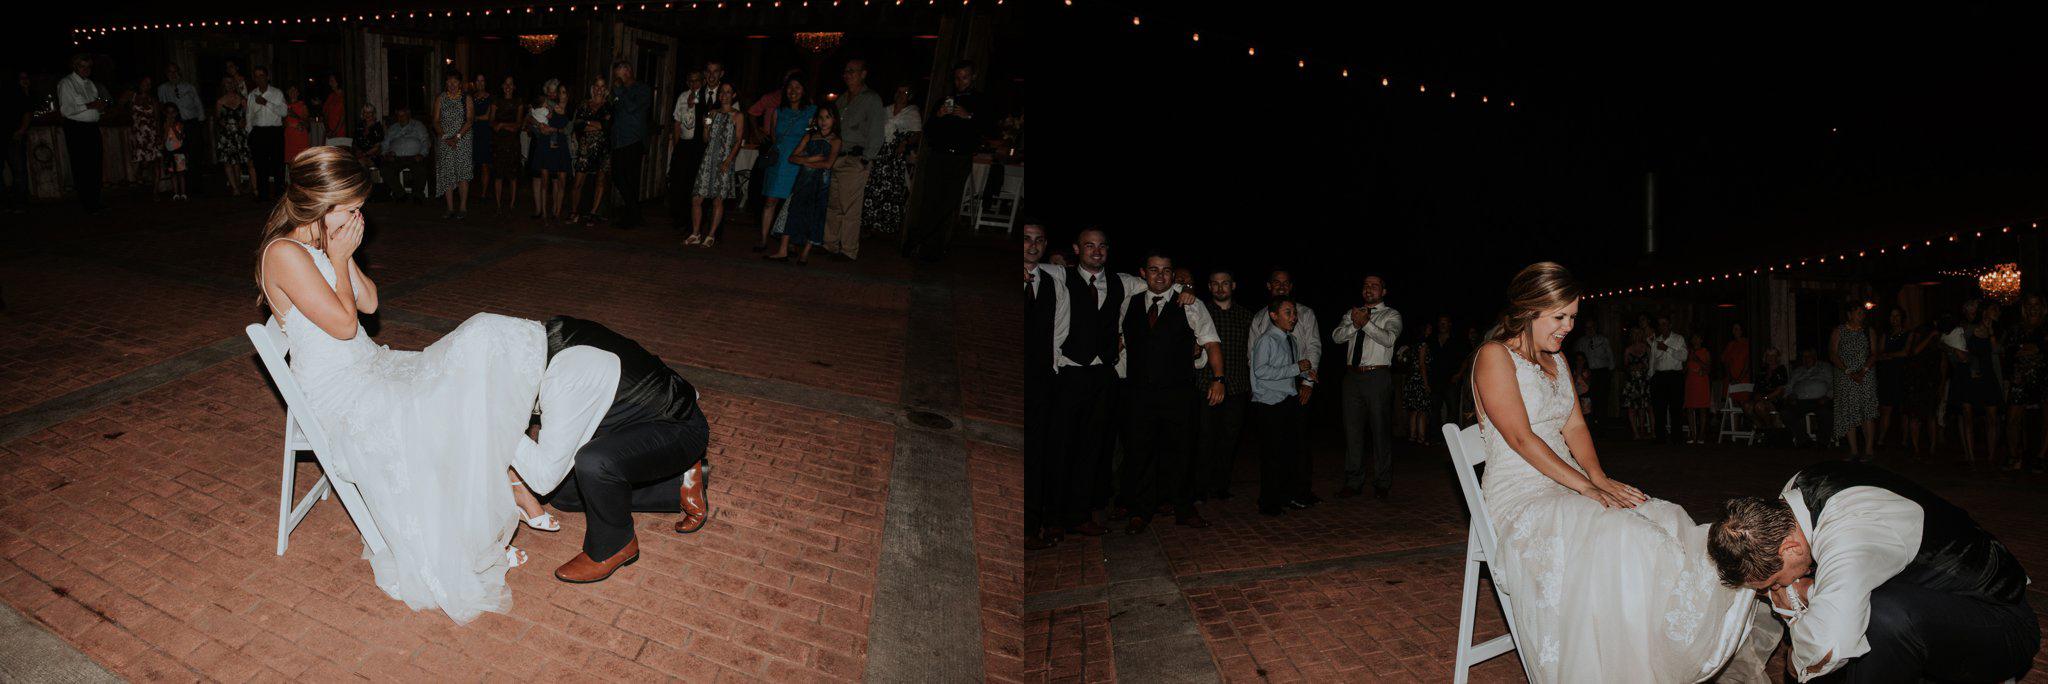 kristen-and-cody-the-kelley-farm-wedding-seattle-photographer-caitlyn-nikula-118.jpg